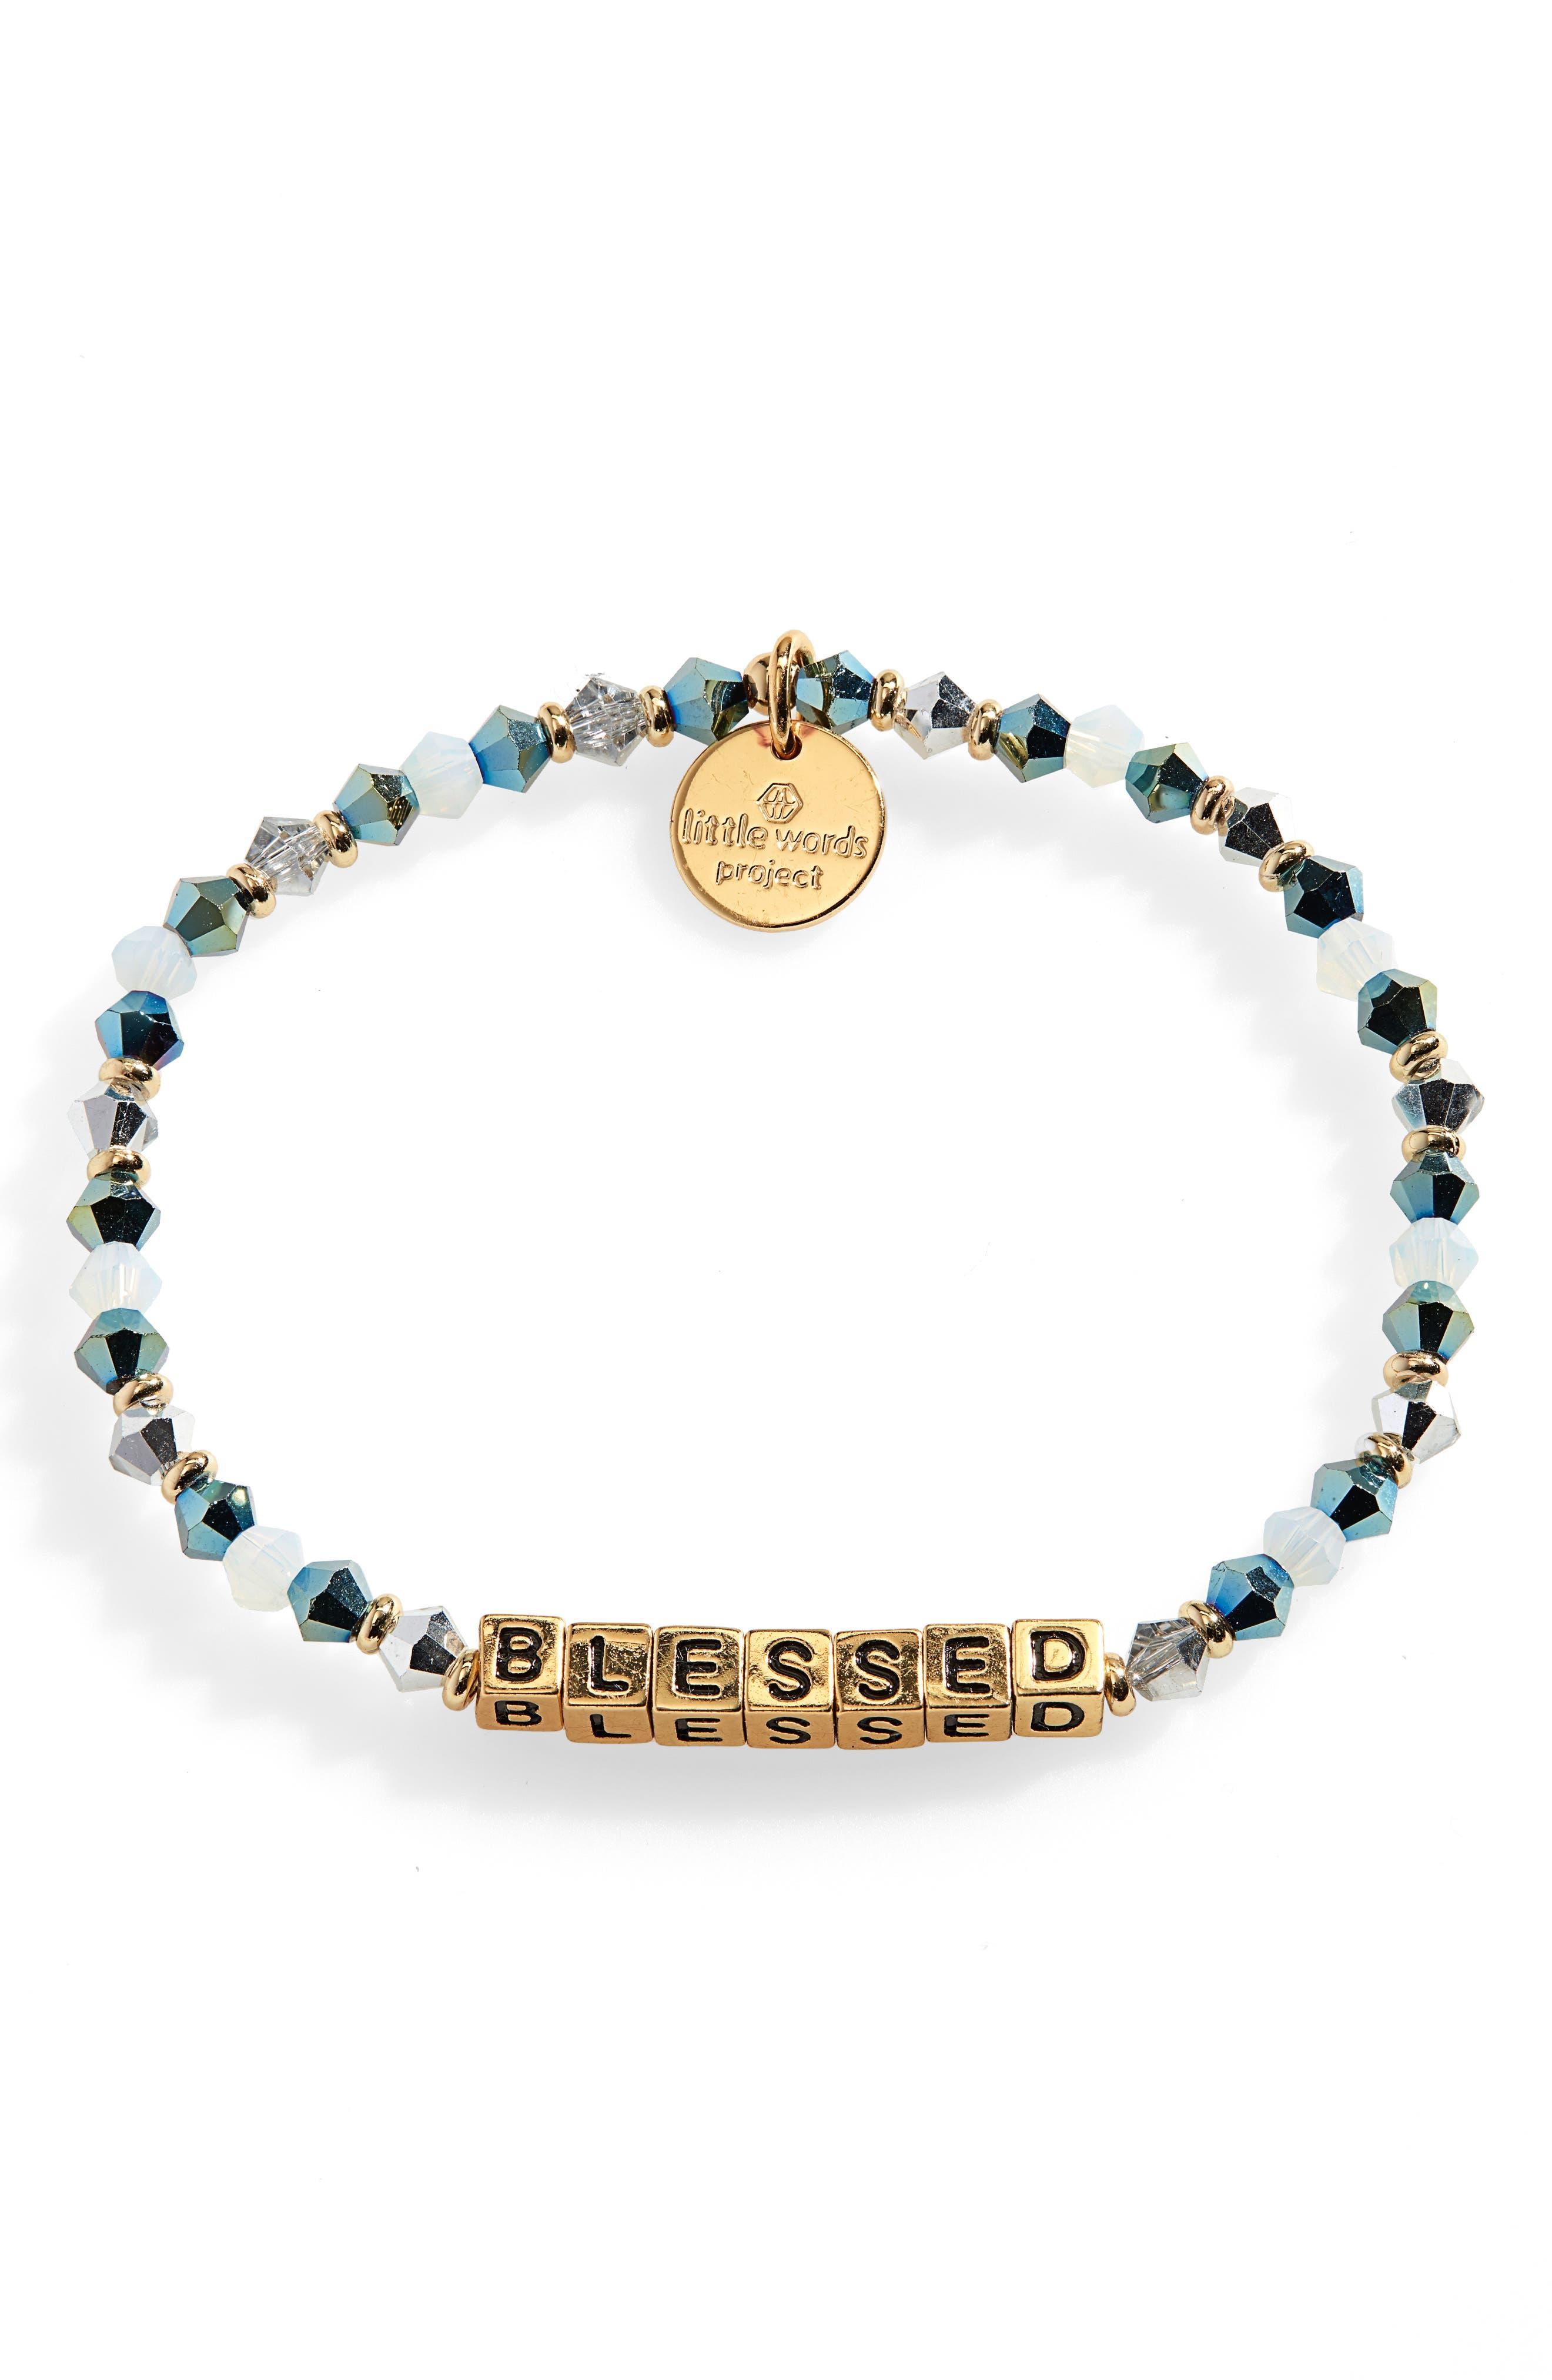 Blessed Beaded Stretch Bracelet